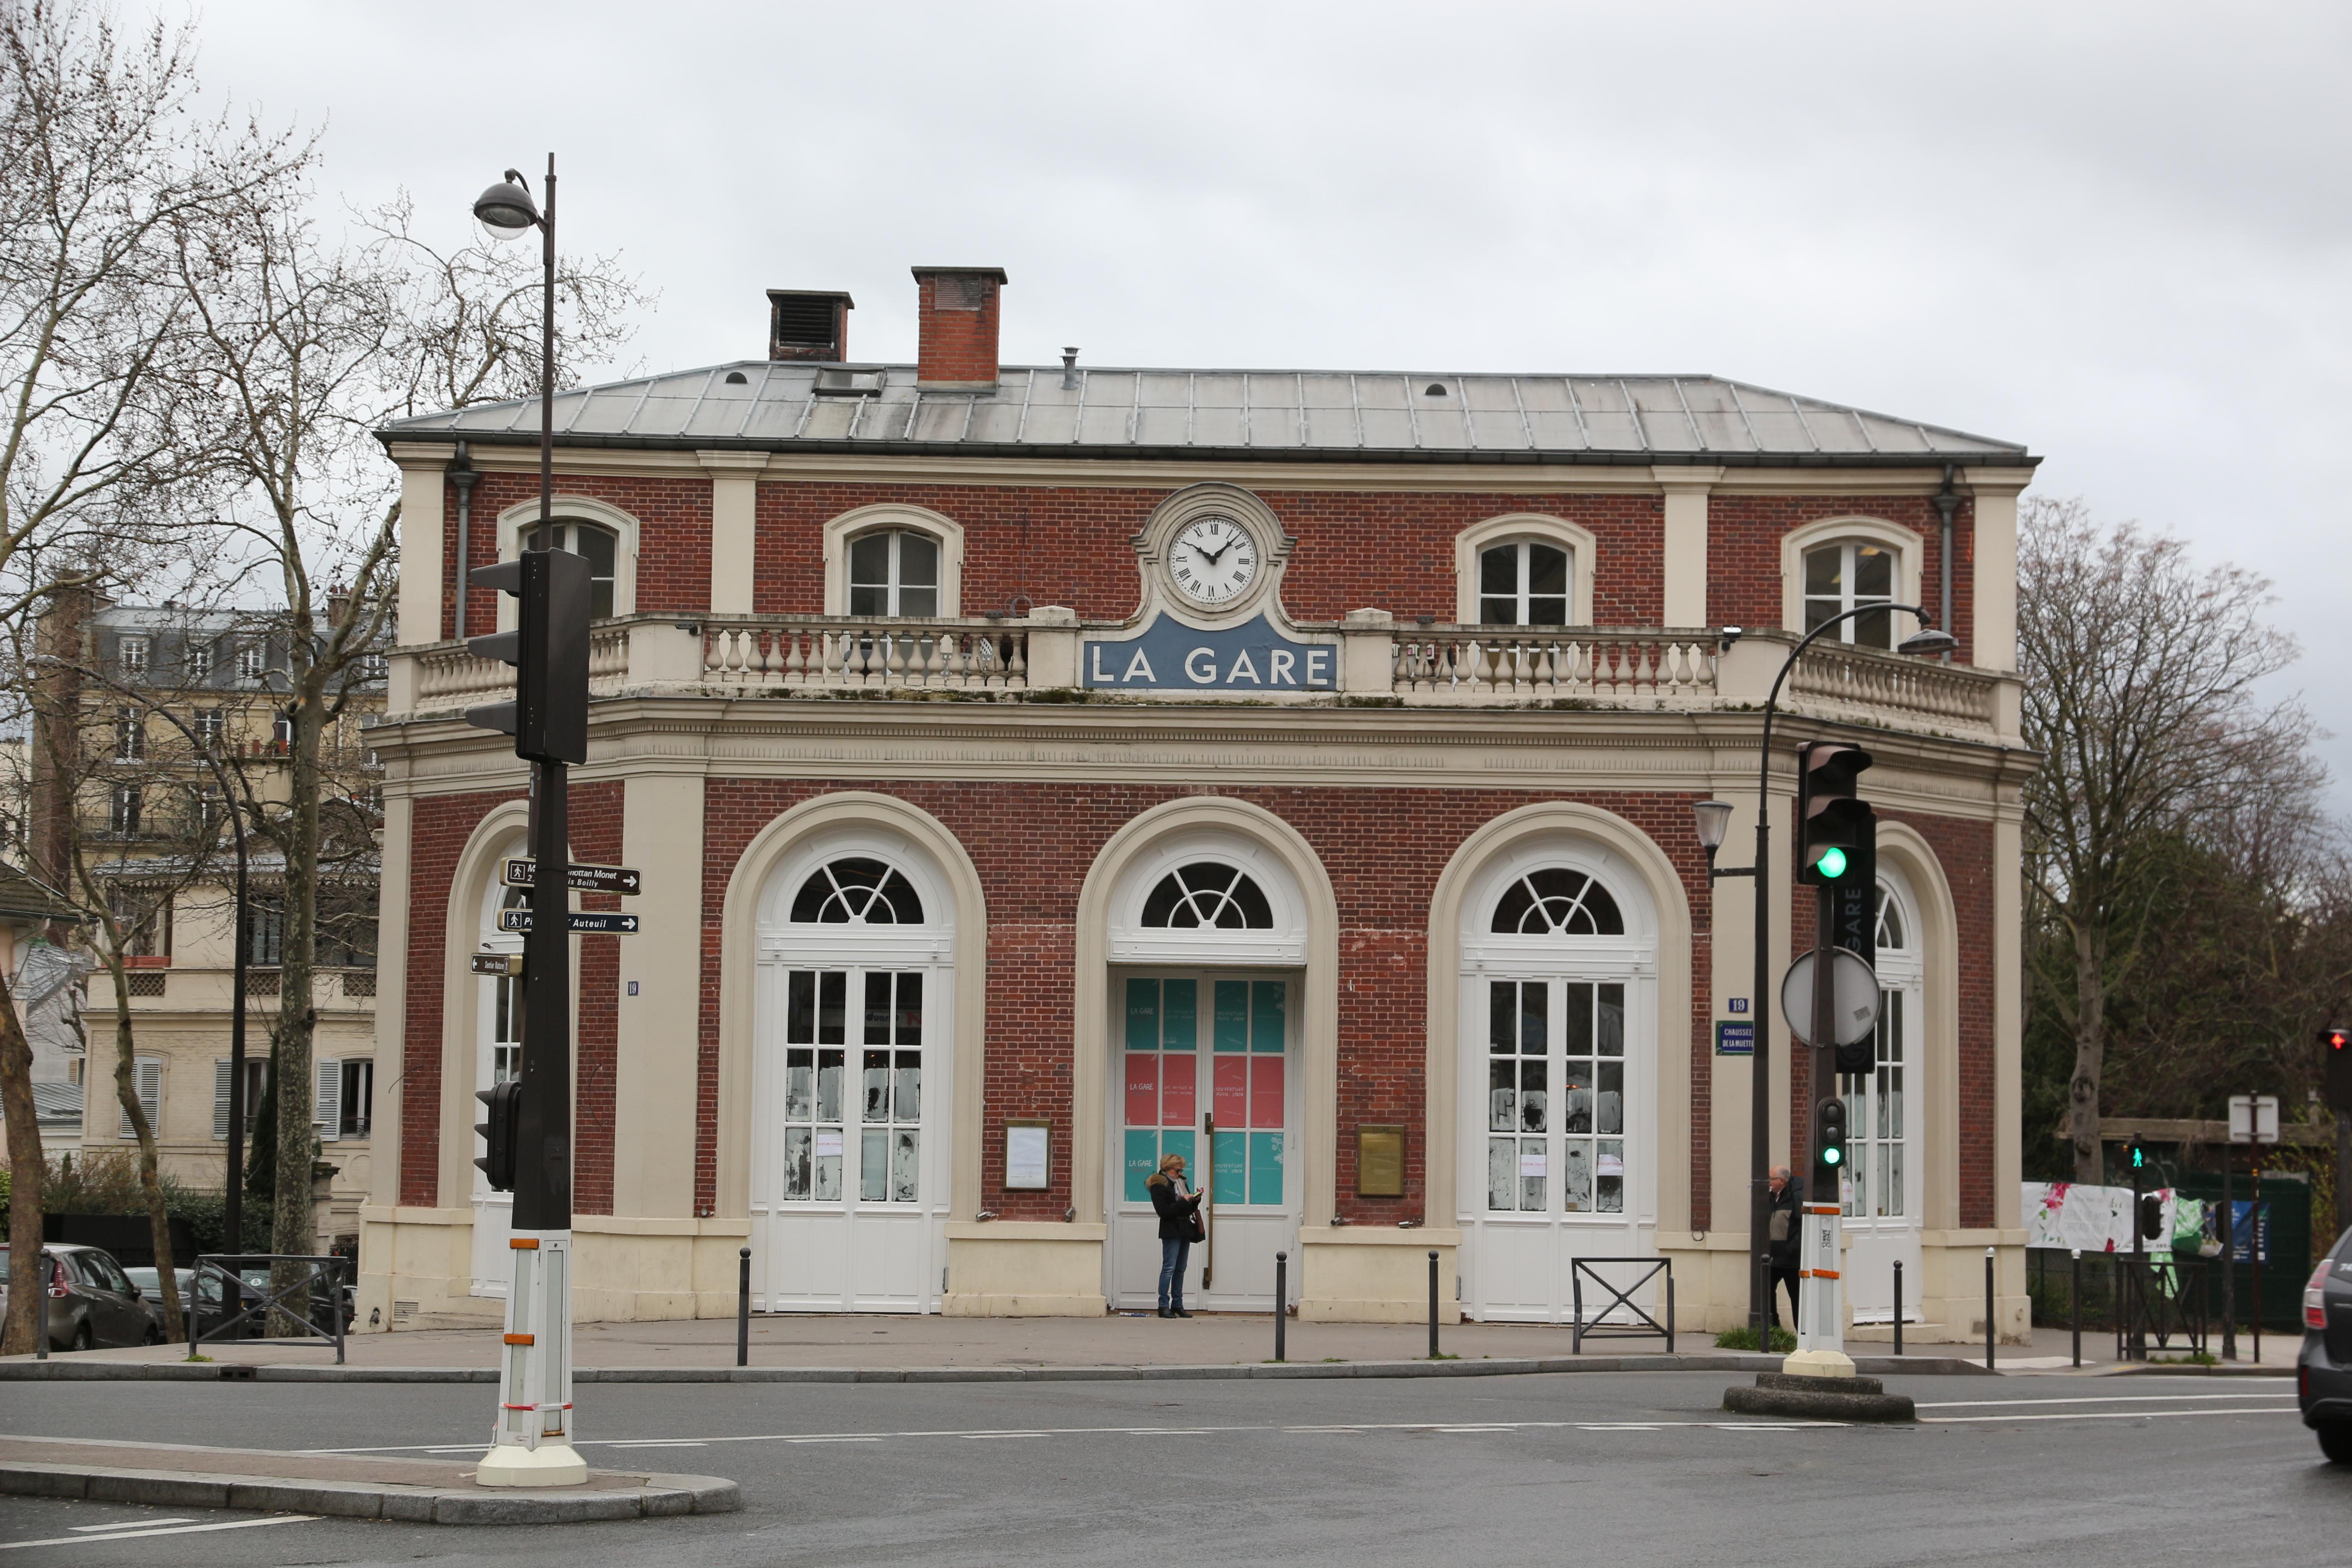 la gare de Passy-la-Muette